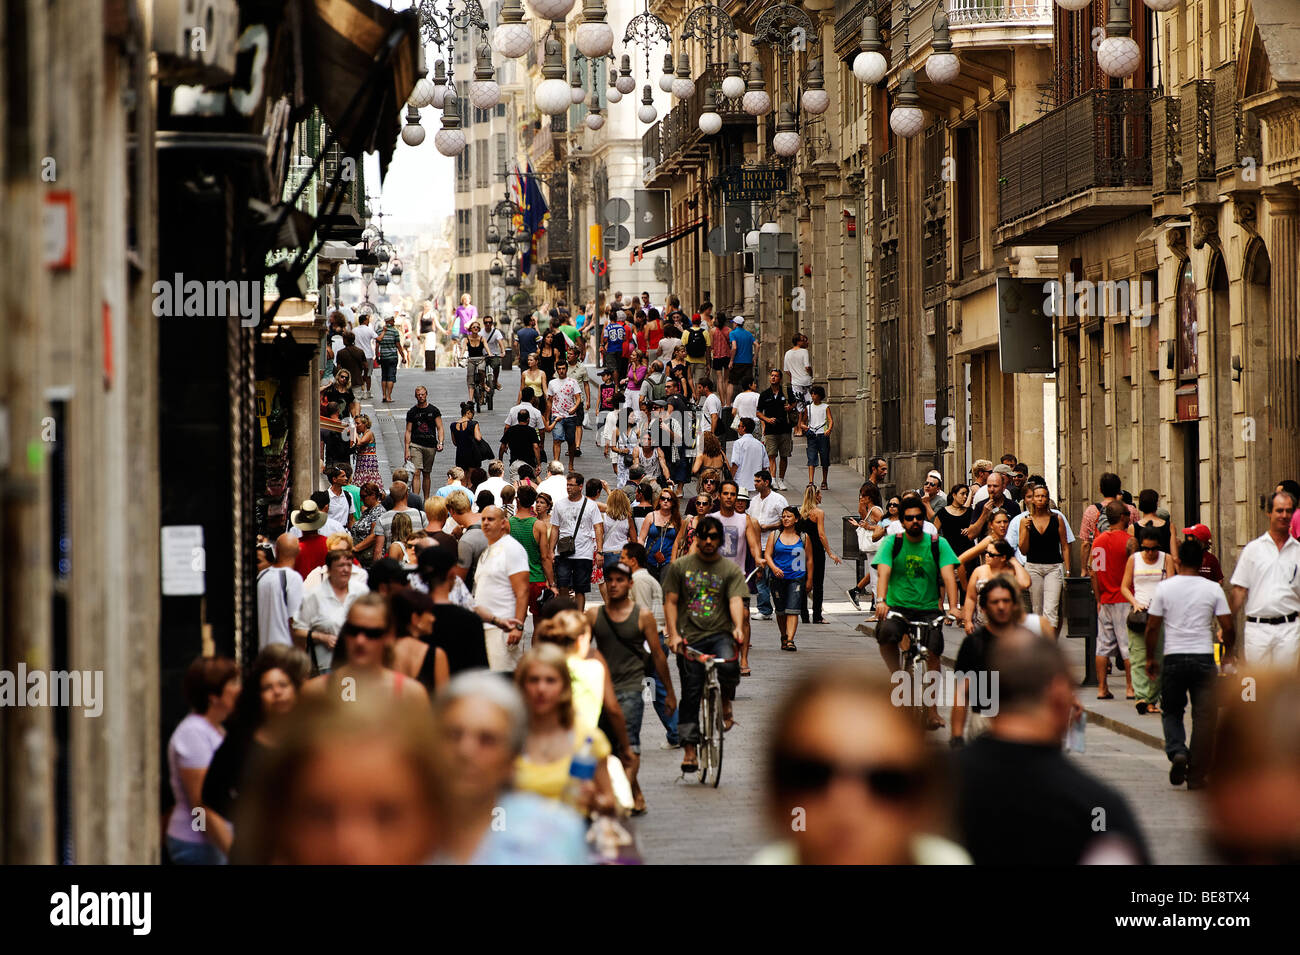 Busy shopping street Carrer de Ferran in Barri Gotic. Barcelona. Spain - Stock Image